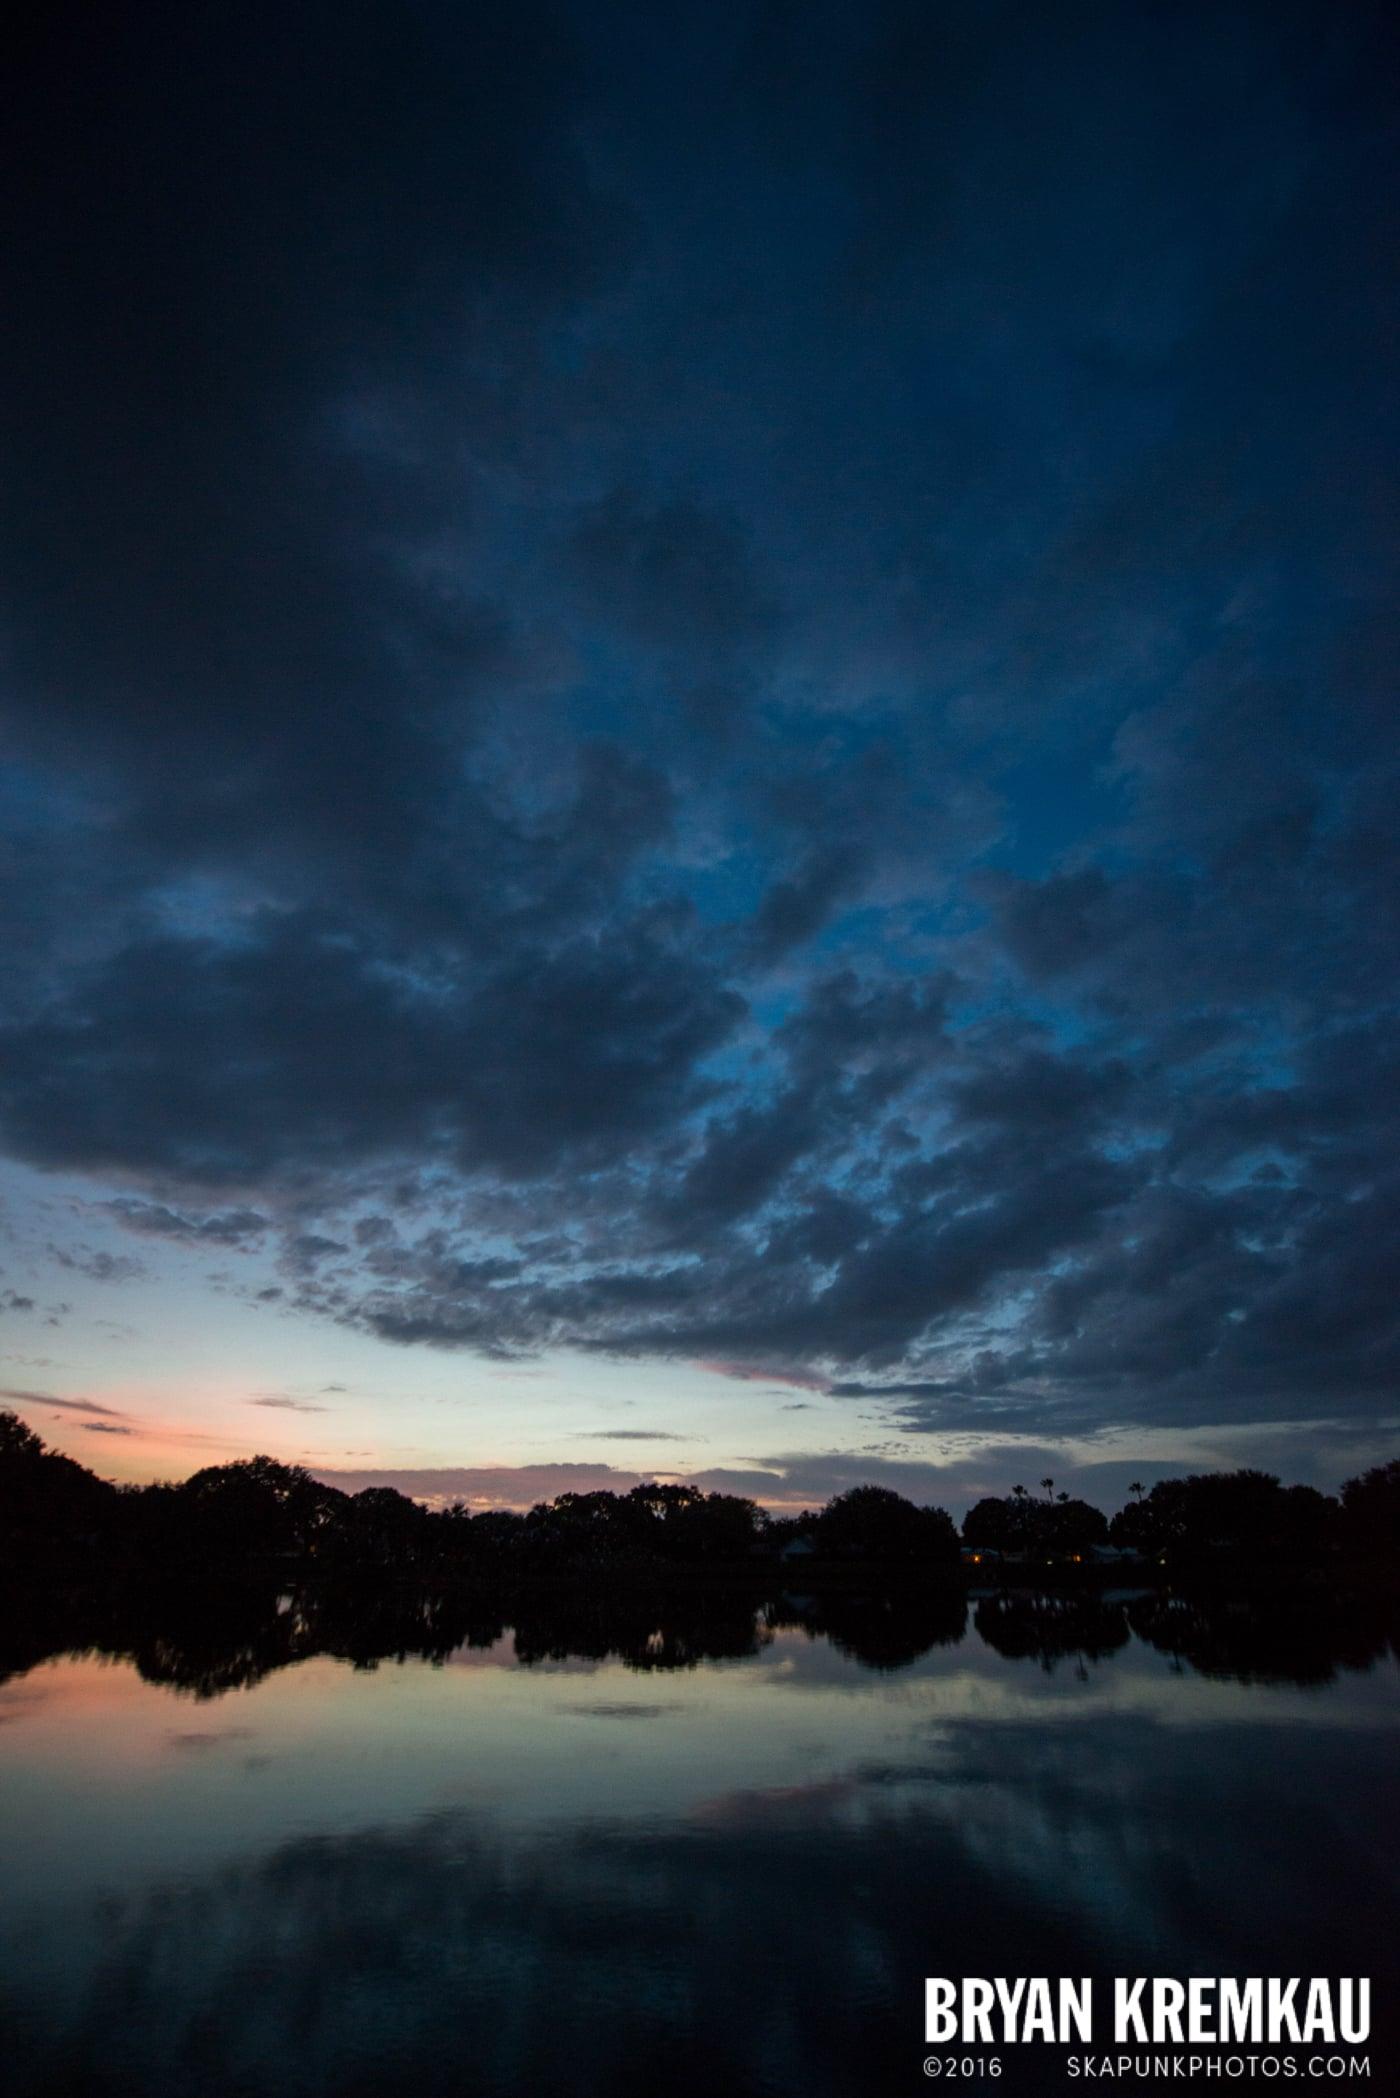 Sunsets, Astrophotography & Birds @ Venice, Florida - 10.25.14 - 11.5.14 (2)